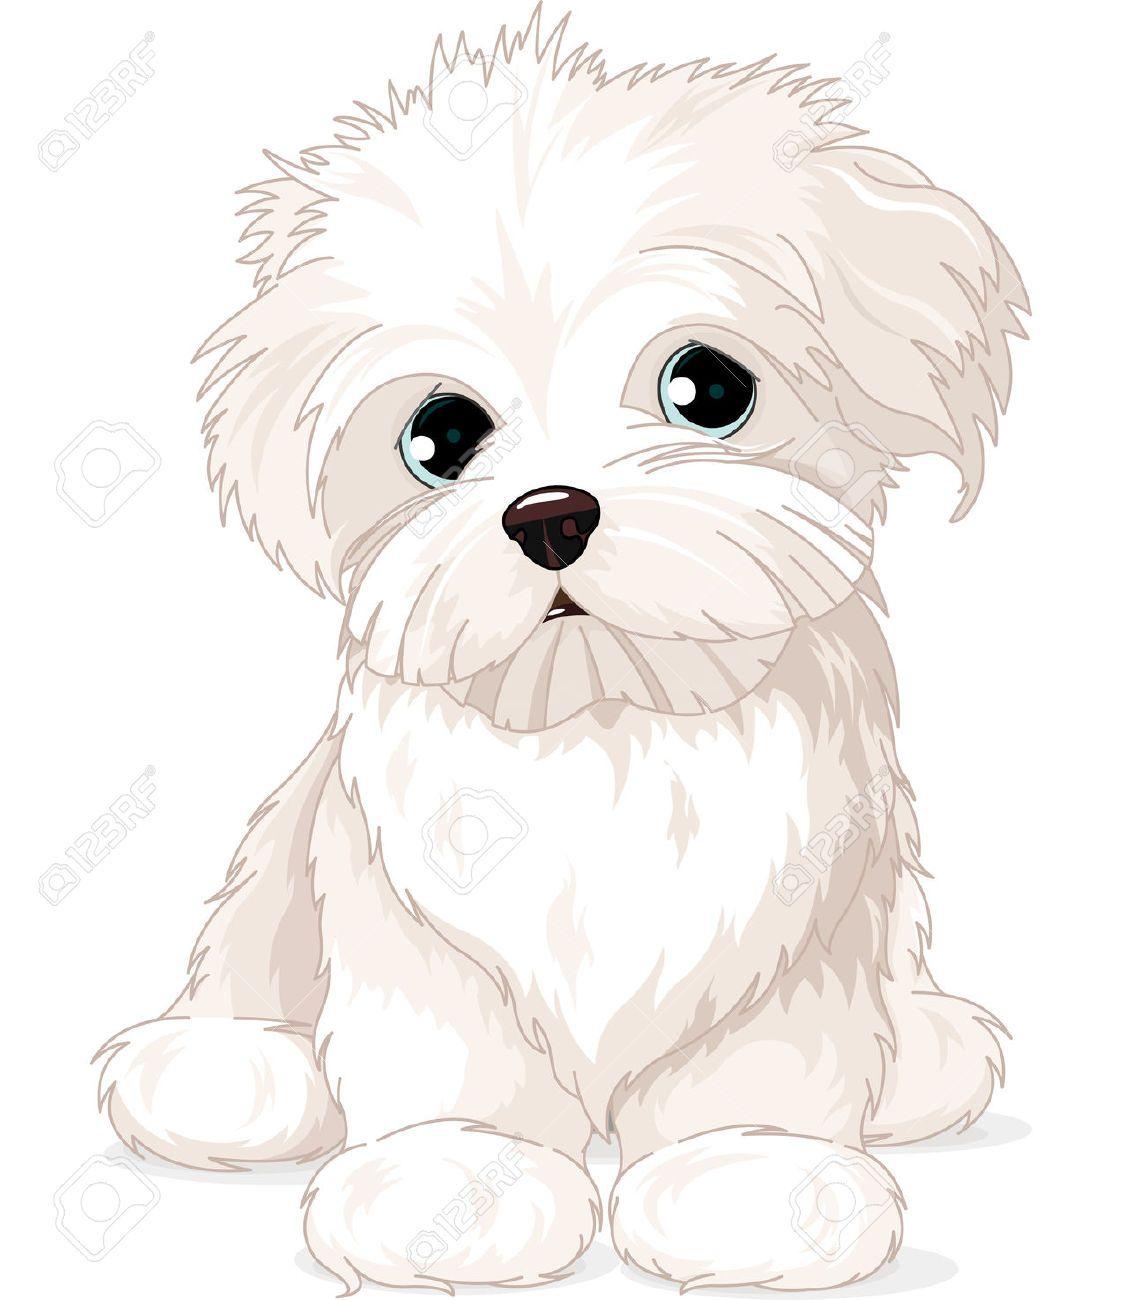 maltese dog clipart maltese  [ 1122 x 1300 Pixel ]